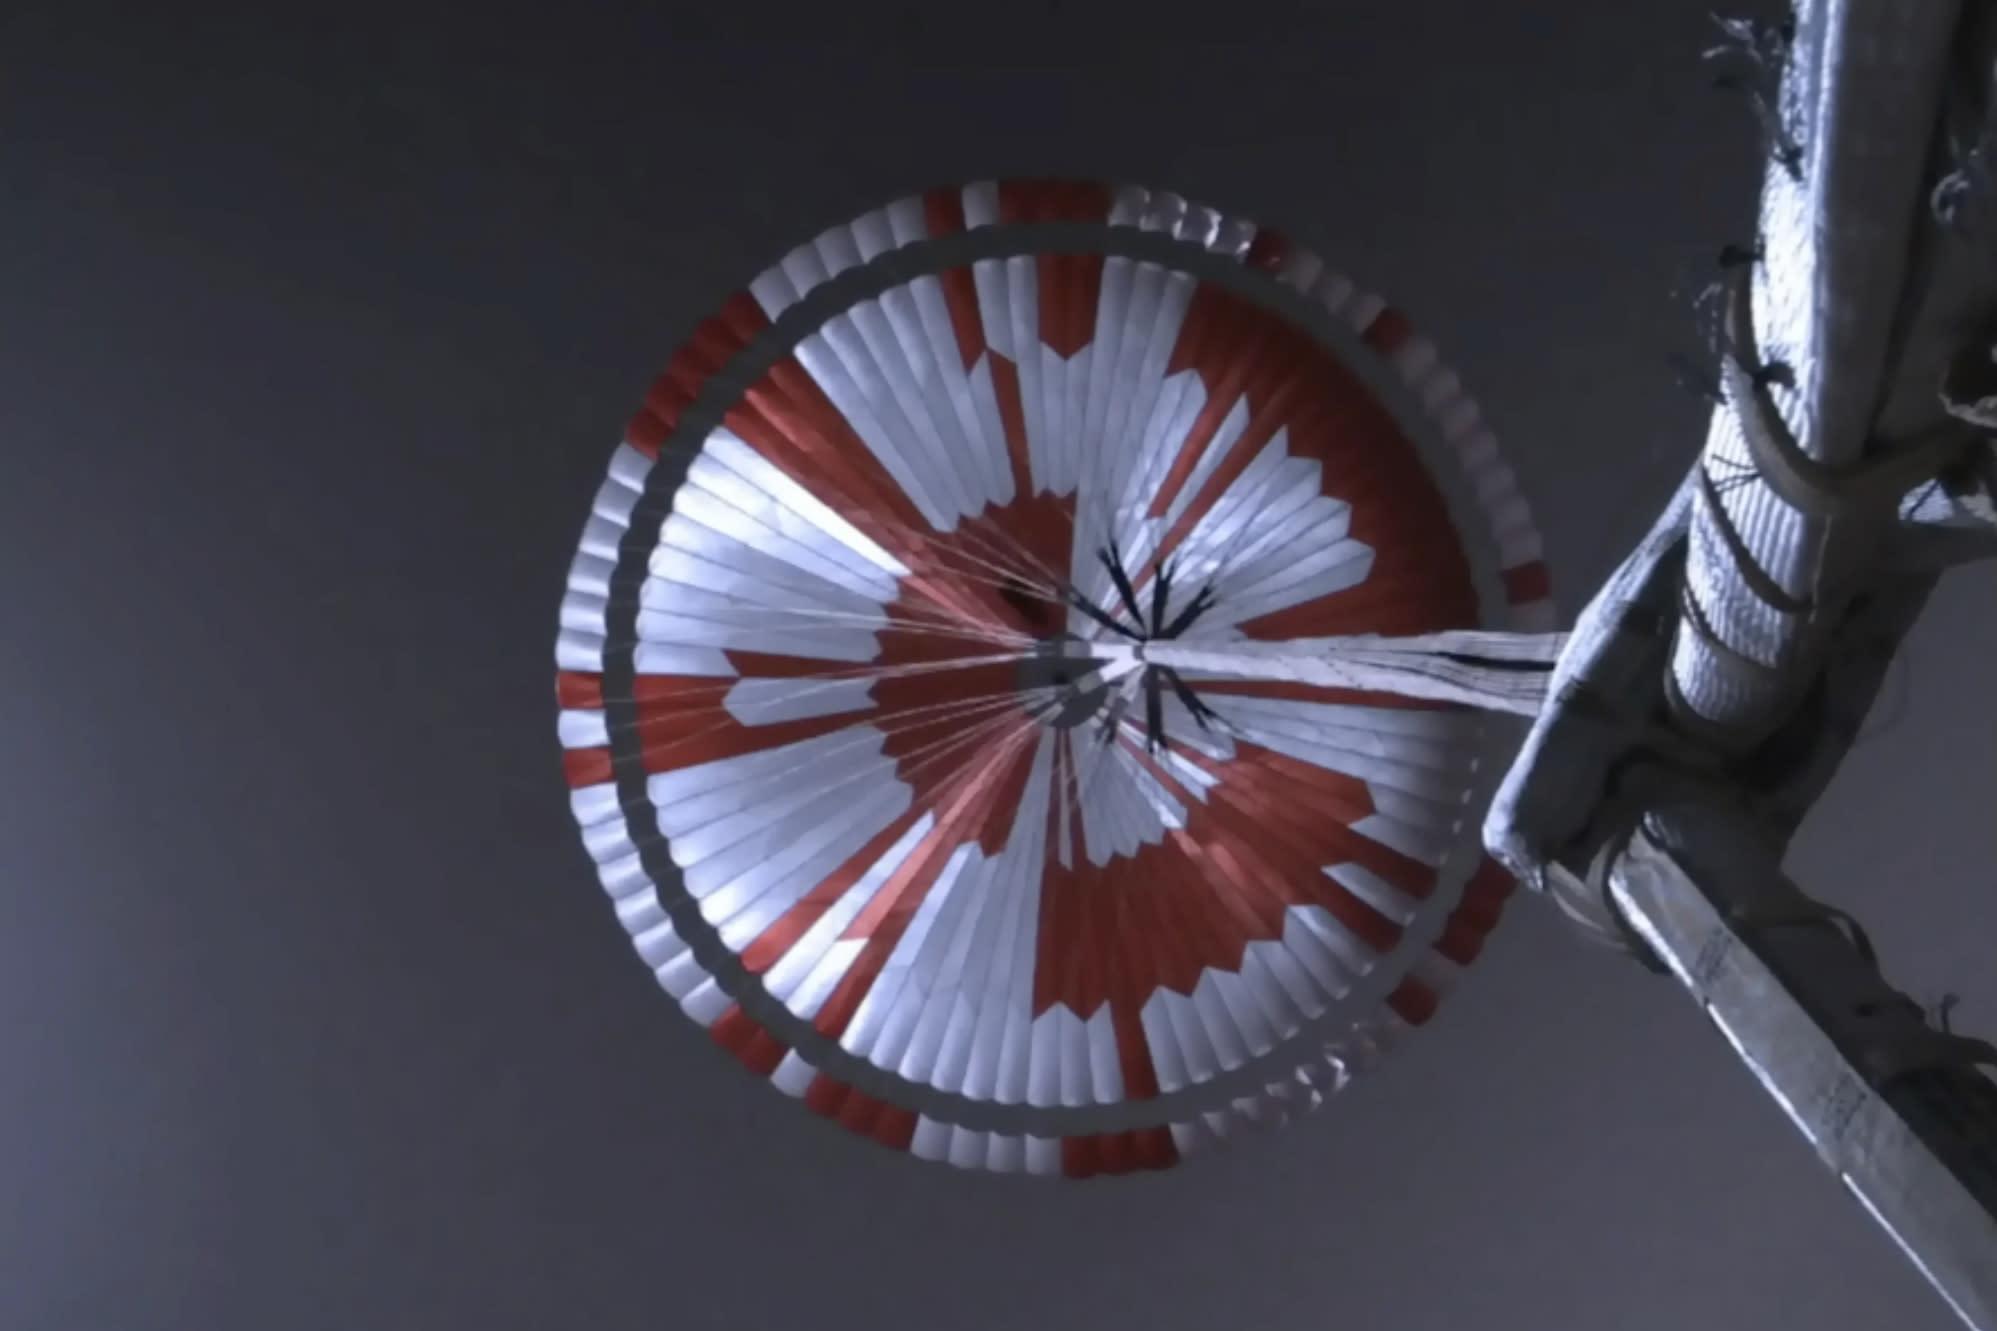 Mars rover's giant parachute carried secret message